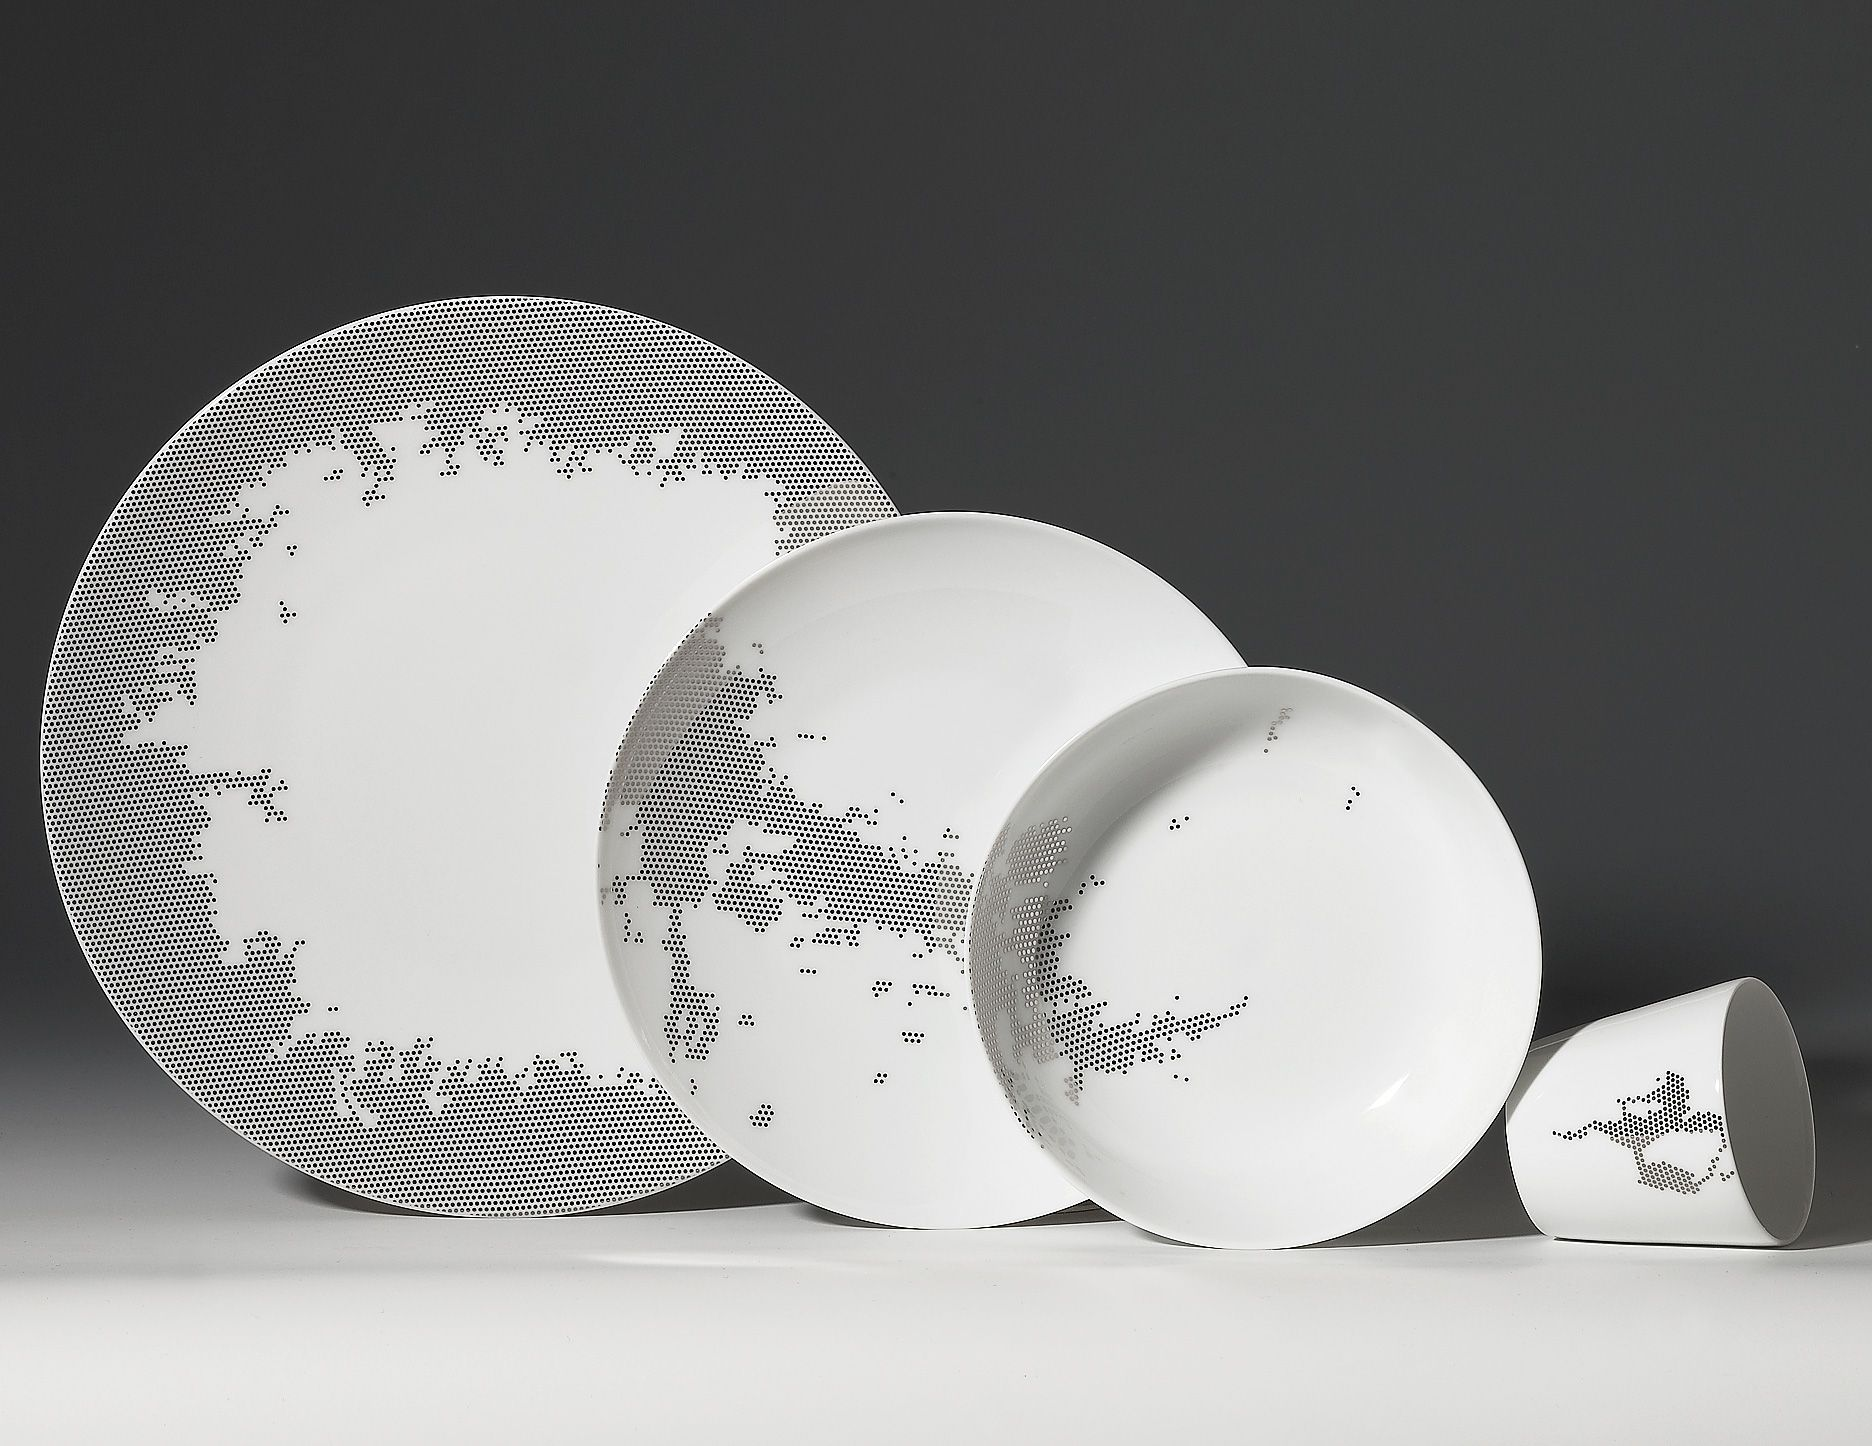 luxury porcelain tableware with modern design by non sans raison  digsdigs. luxury porcelain tableware with modern design by non sans raison